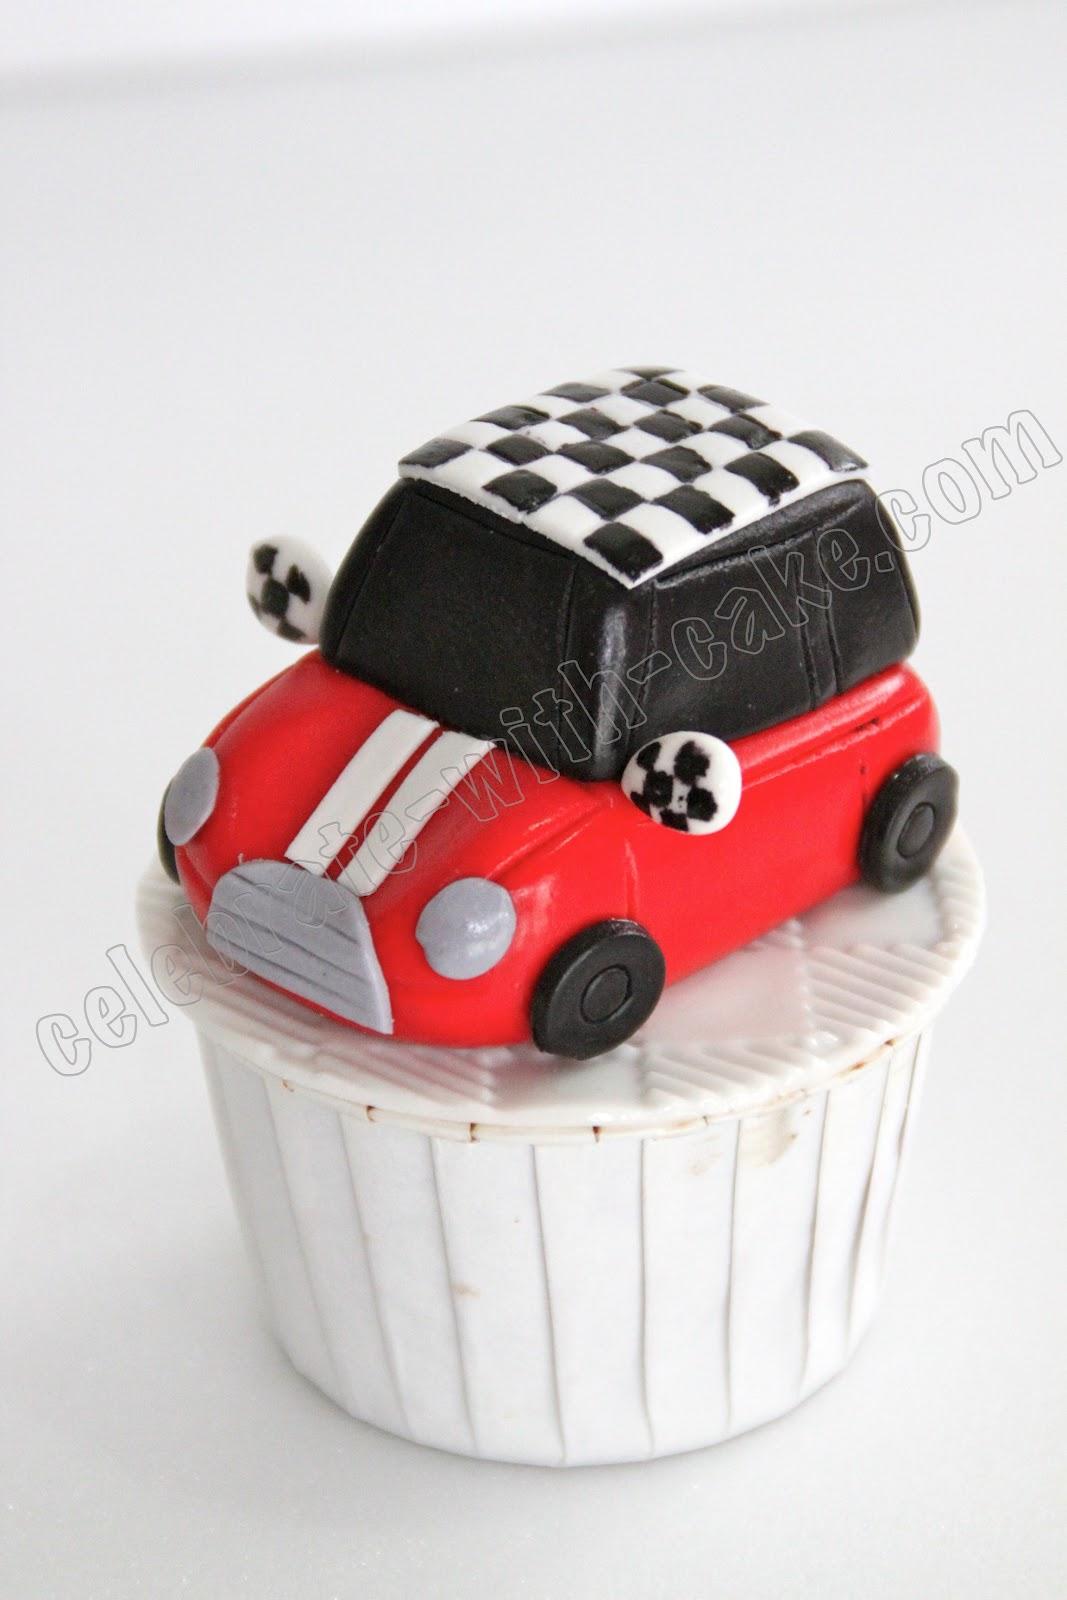 Celebrate with Cake Customized Cupcakes